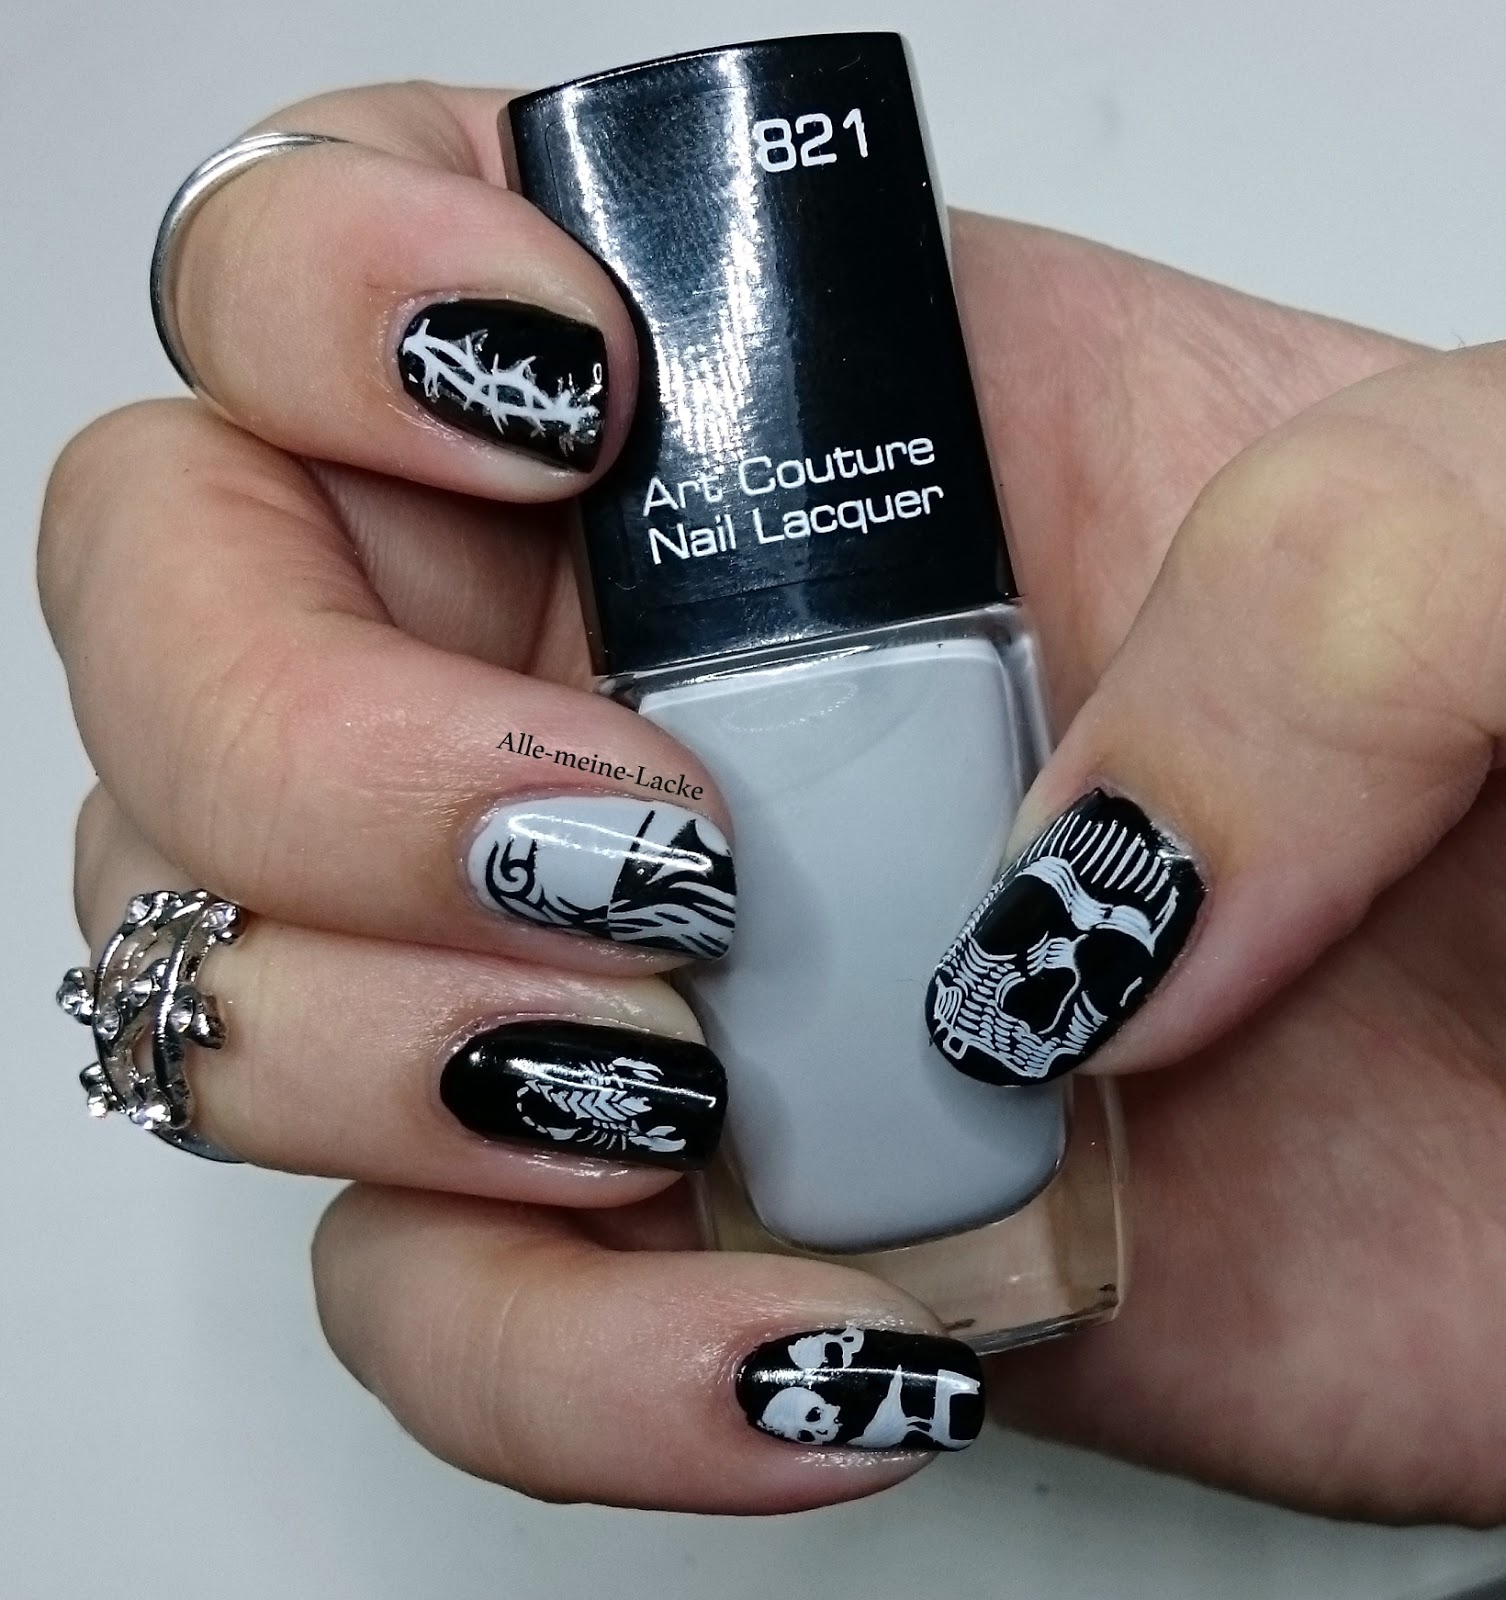 Alle meine Lacke: Coole Nägel im Rock-Design